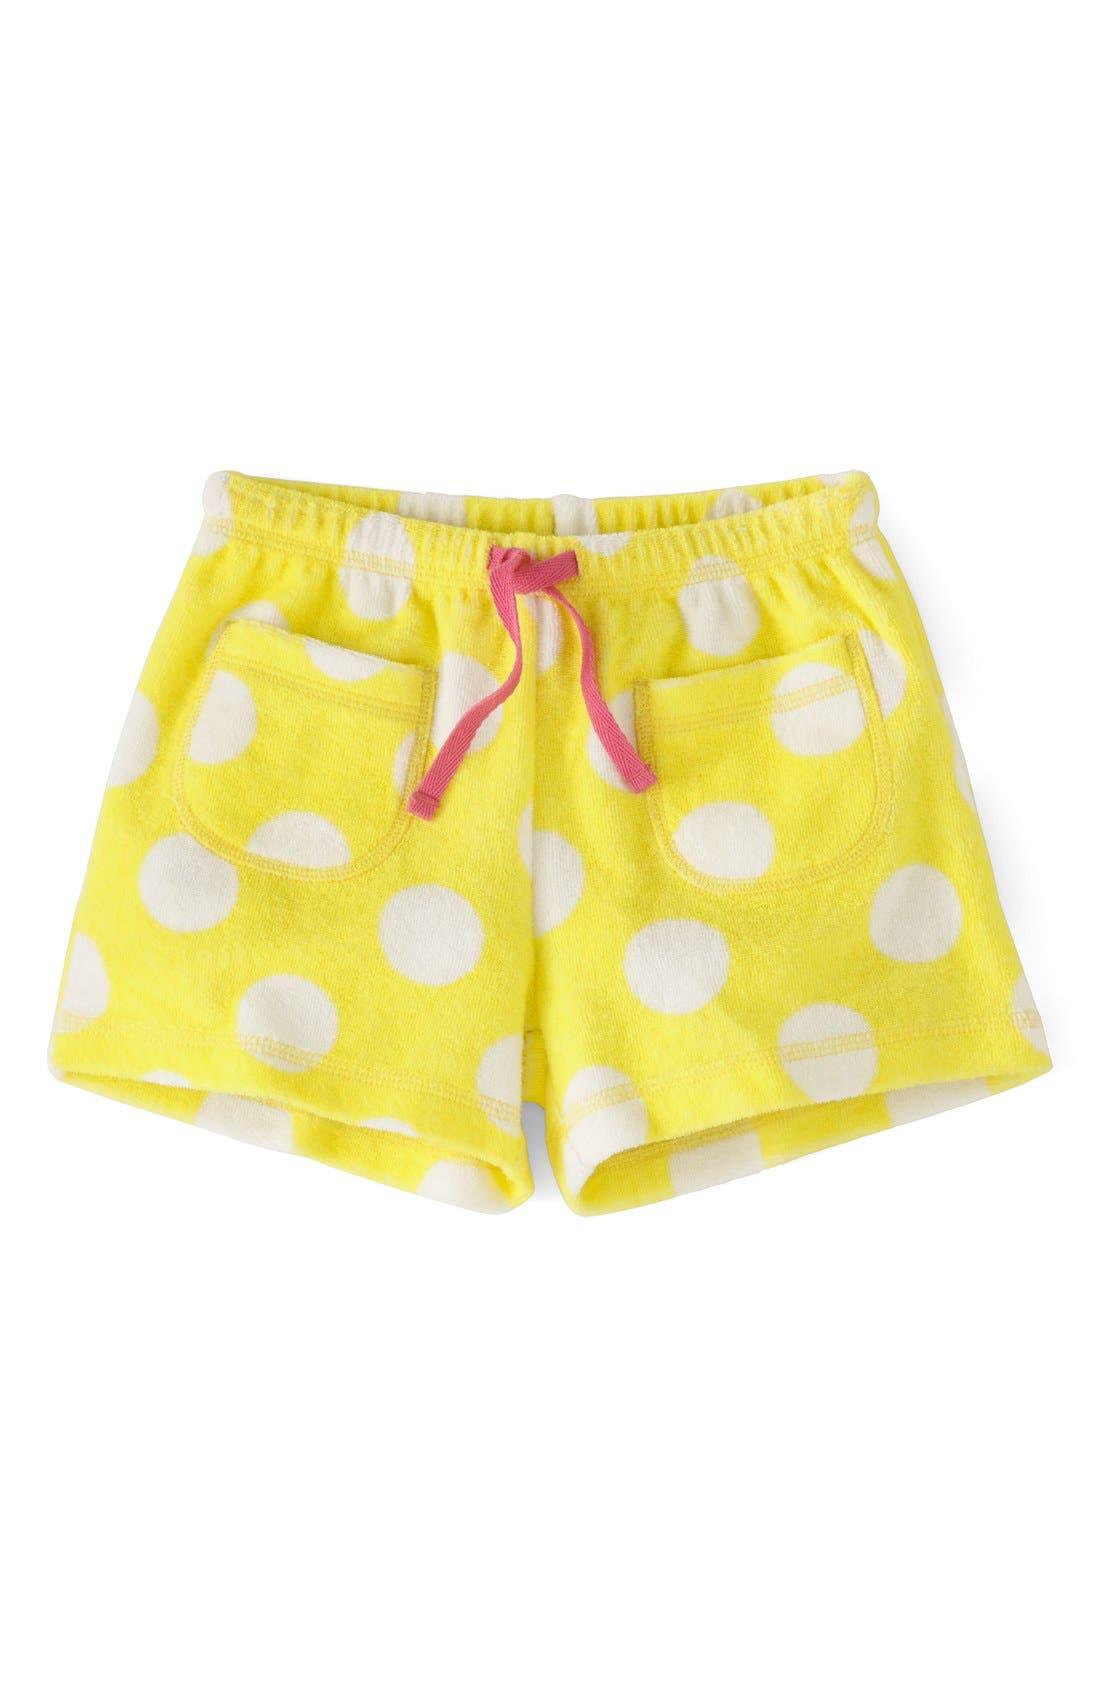 Main Image - Mini Boden 'Towelling' Shorts (Toddler Girls, Little Girls & Big Girls)(Online Only)